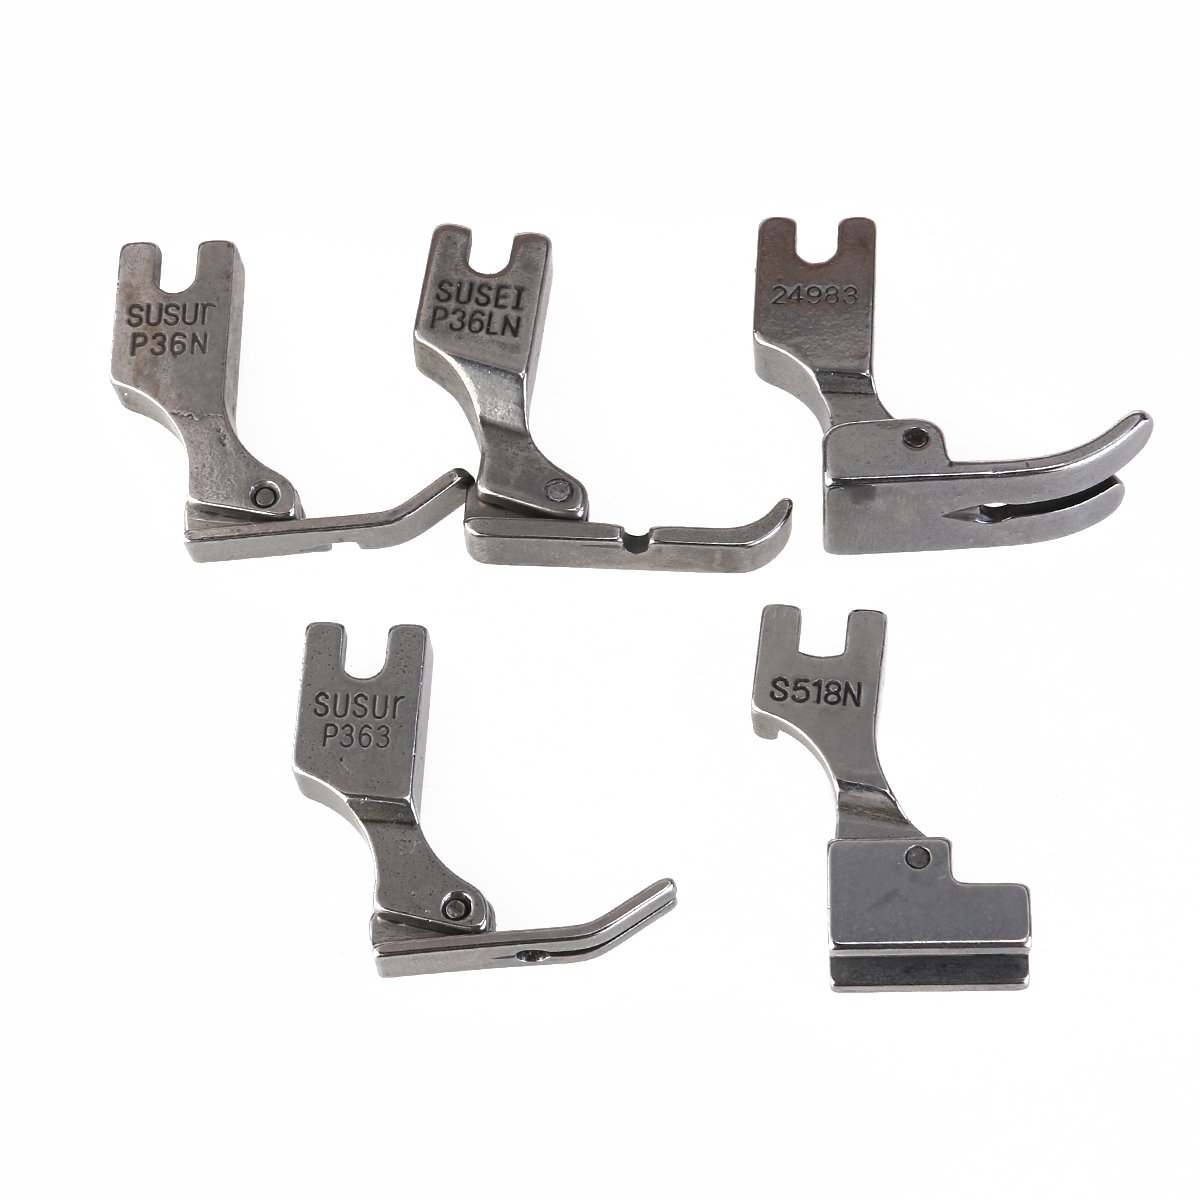 UEETEK 5pcs Piedino industriale Piedi di cucito per industriali Juki macchina per cucire S518NS P36LN P36N P35 P363 (argento)